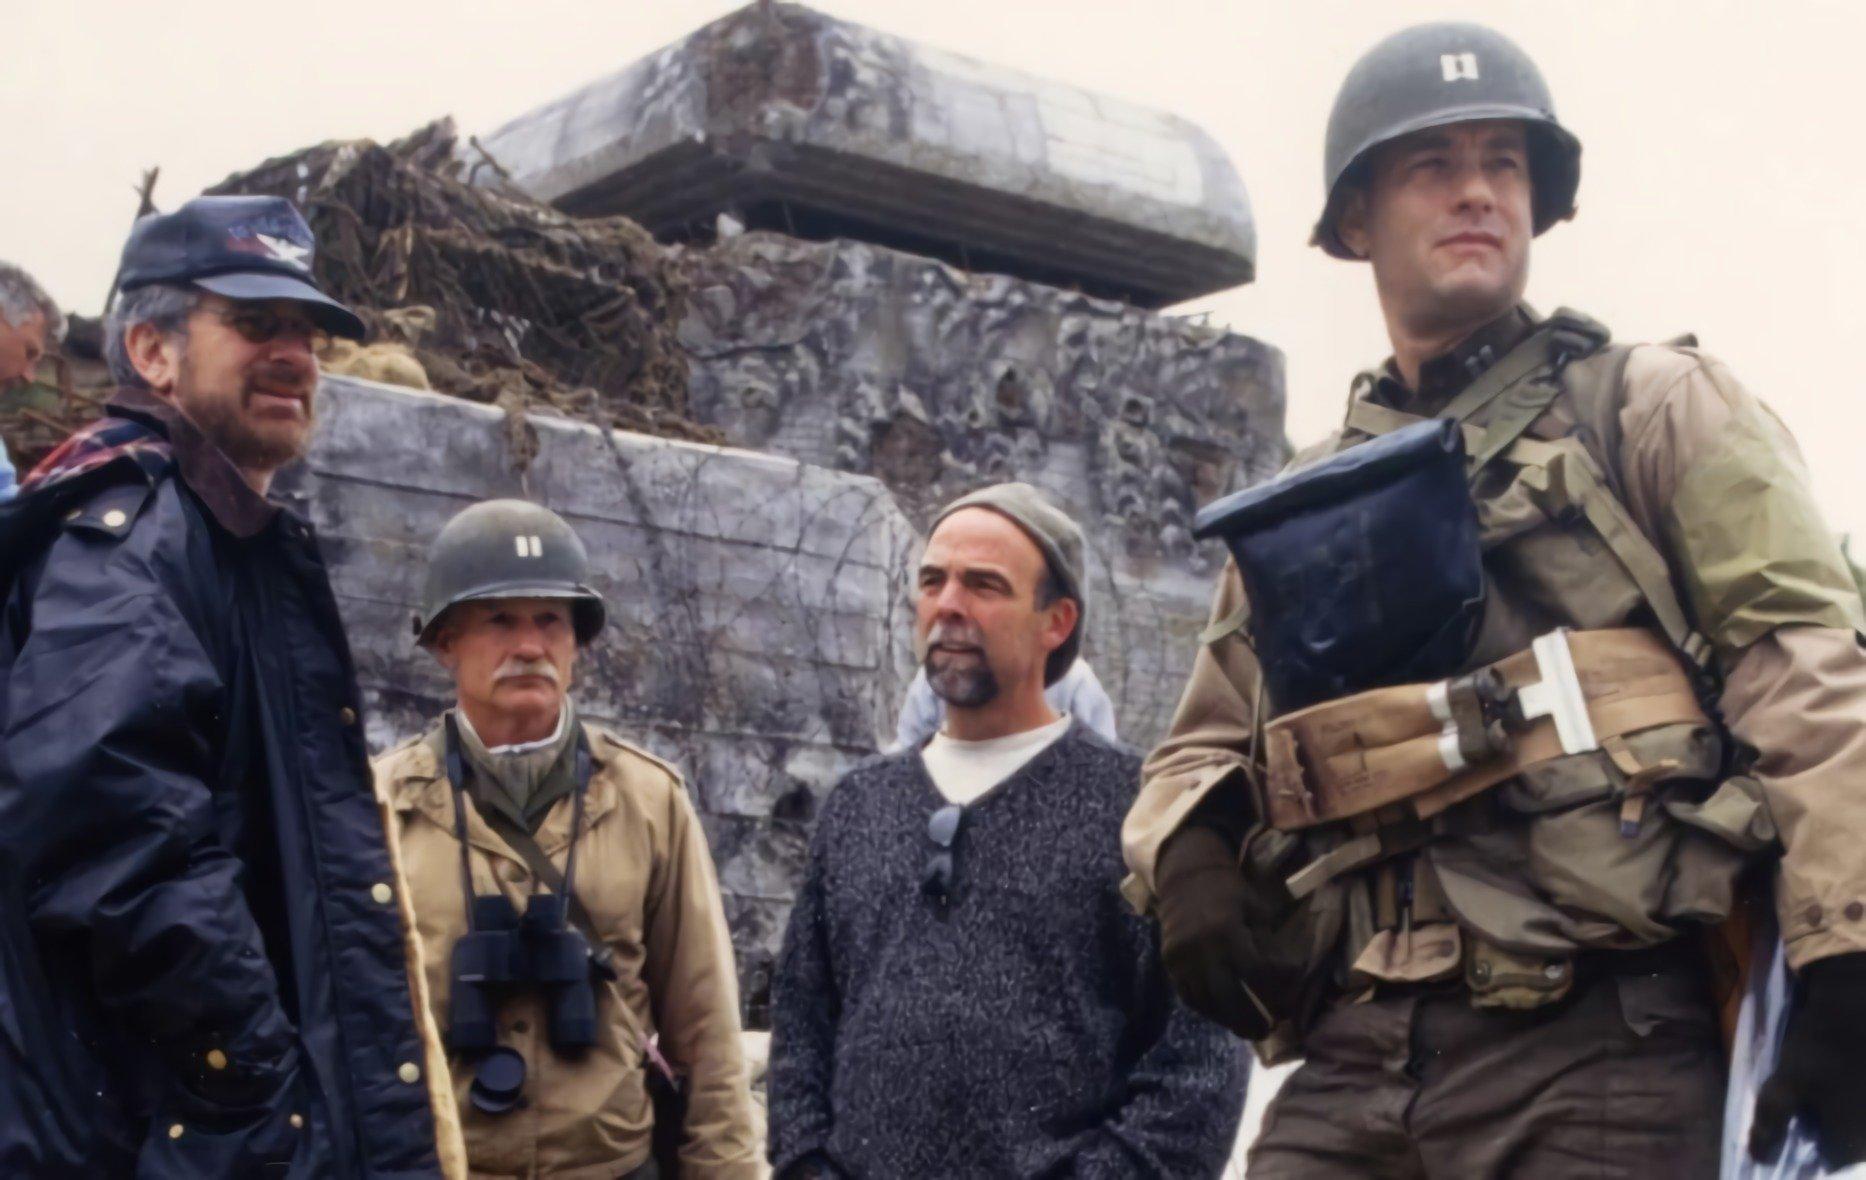 Spielberg Hanks D-Day Omaha Beach